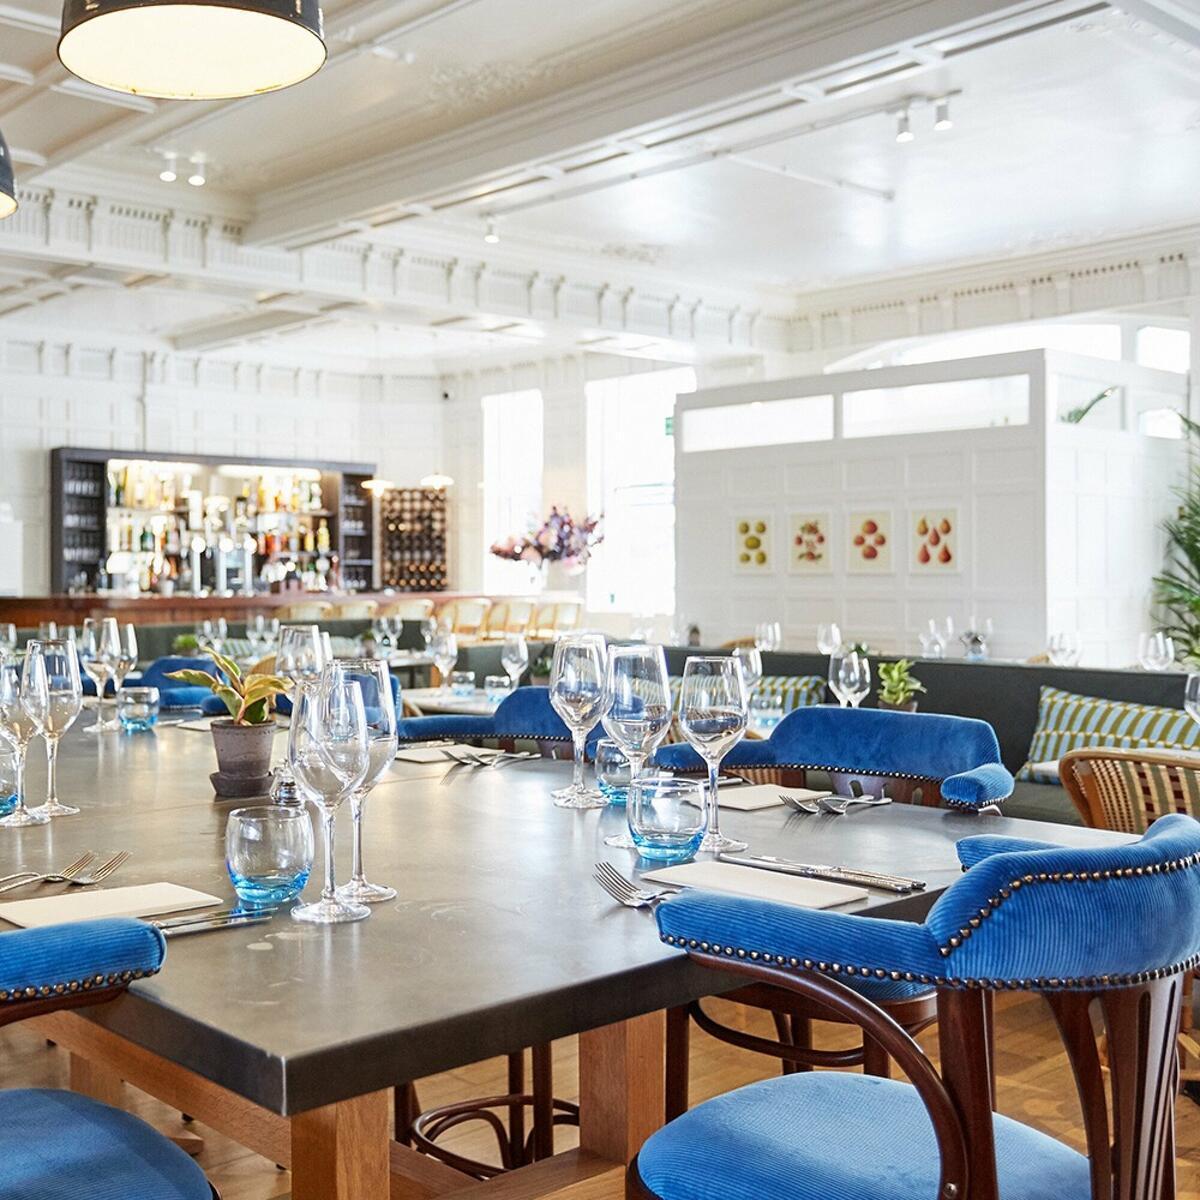 The Hereford, Our Brasserie Restaurant